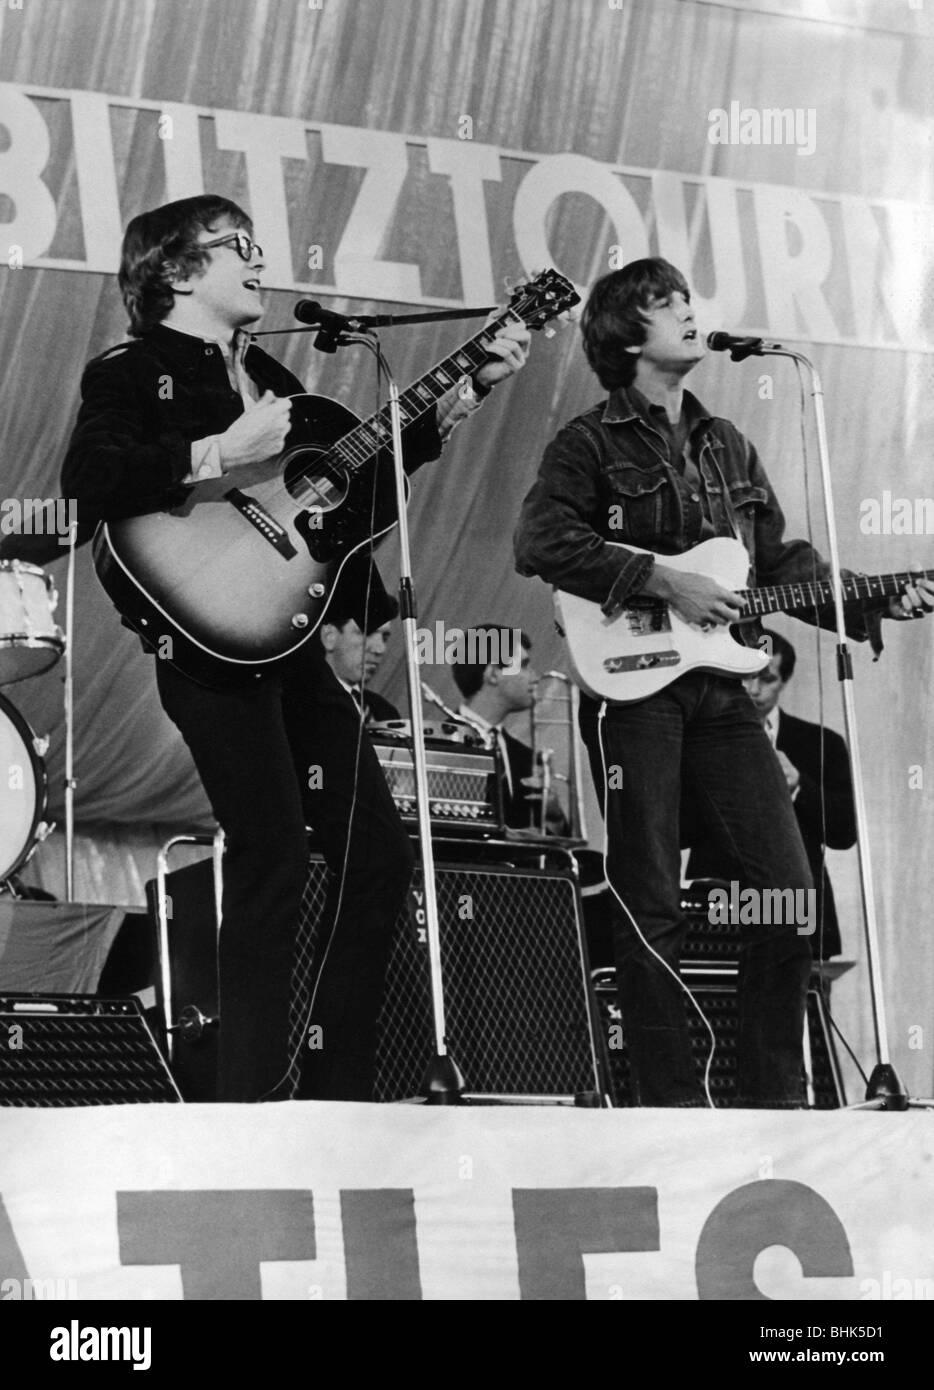 Peter and Gordon, British music group (pop), 1964 - 1968, (* 22.6.1944), Gordon Waller (4.6.1945 - 17.6.2009), during Stock Photo